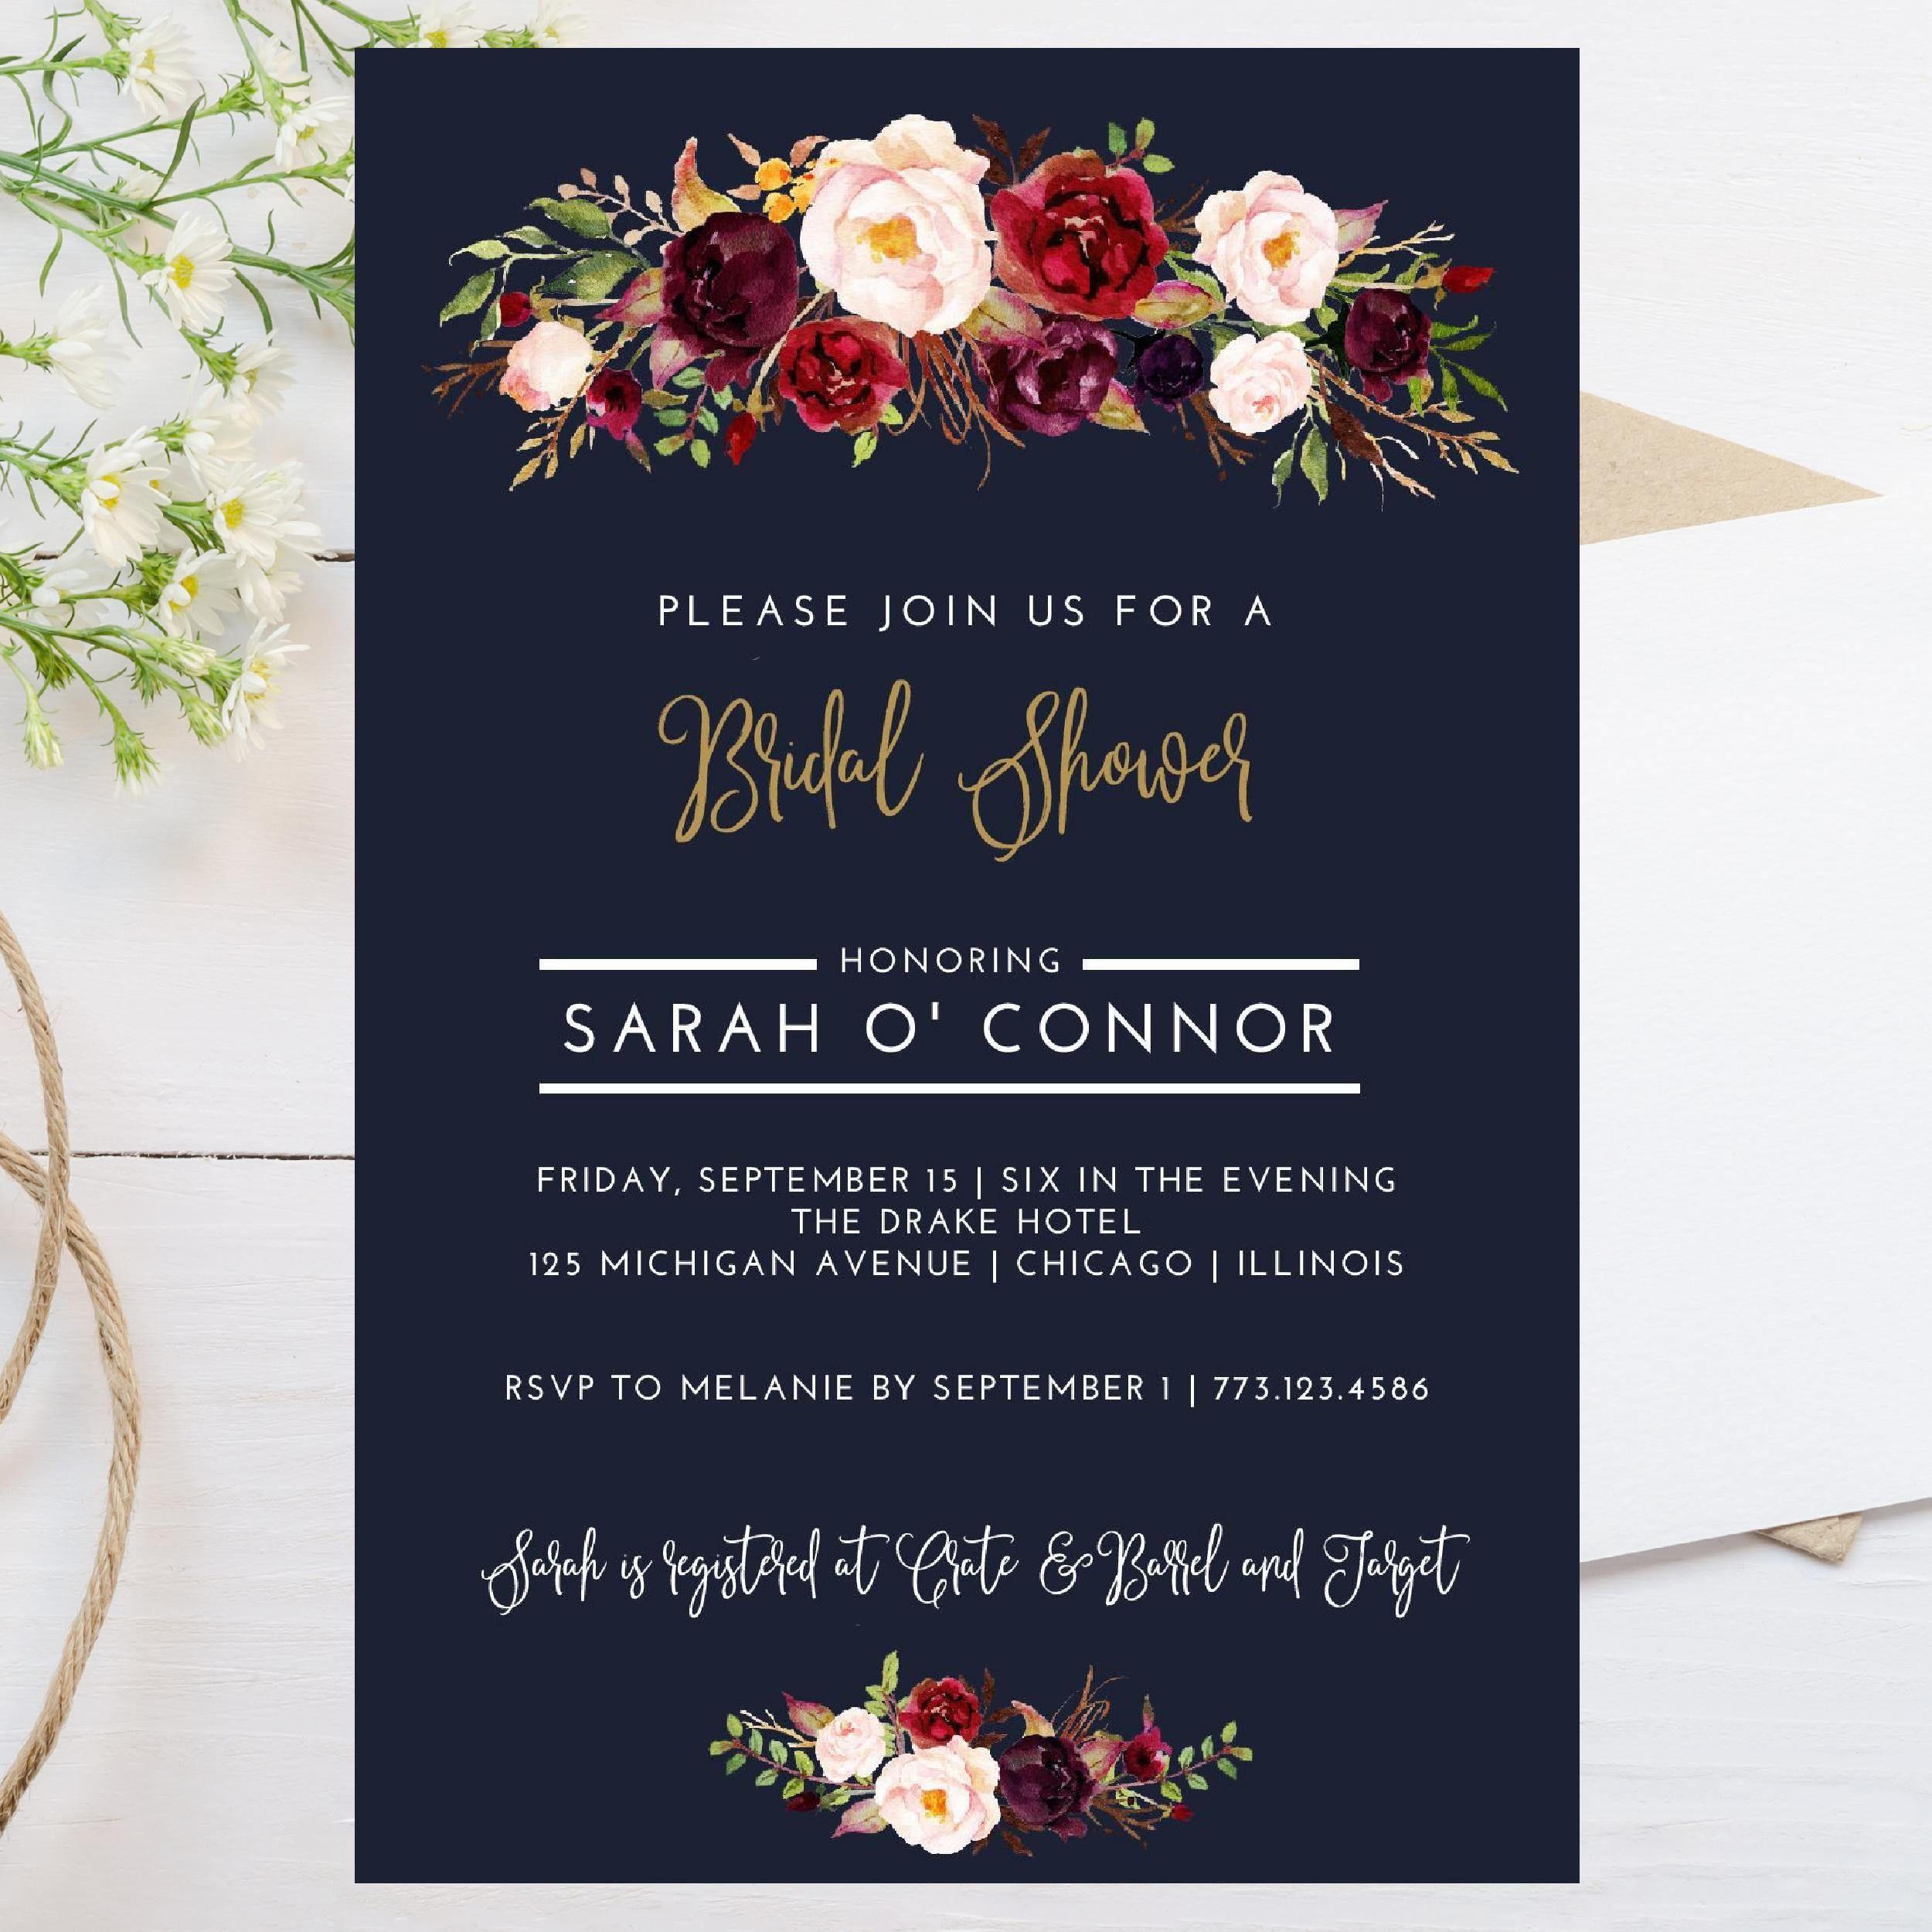 Digital 4x6 Fall Theme Bridal Shower Invitation Dark Navy Blue Maroon Burgundy Watercolor Elegant Invite Wedding Template By